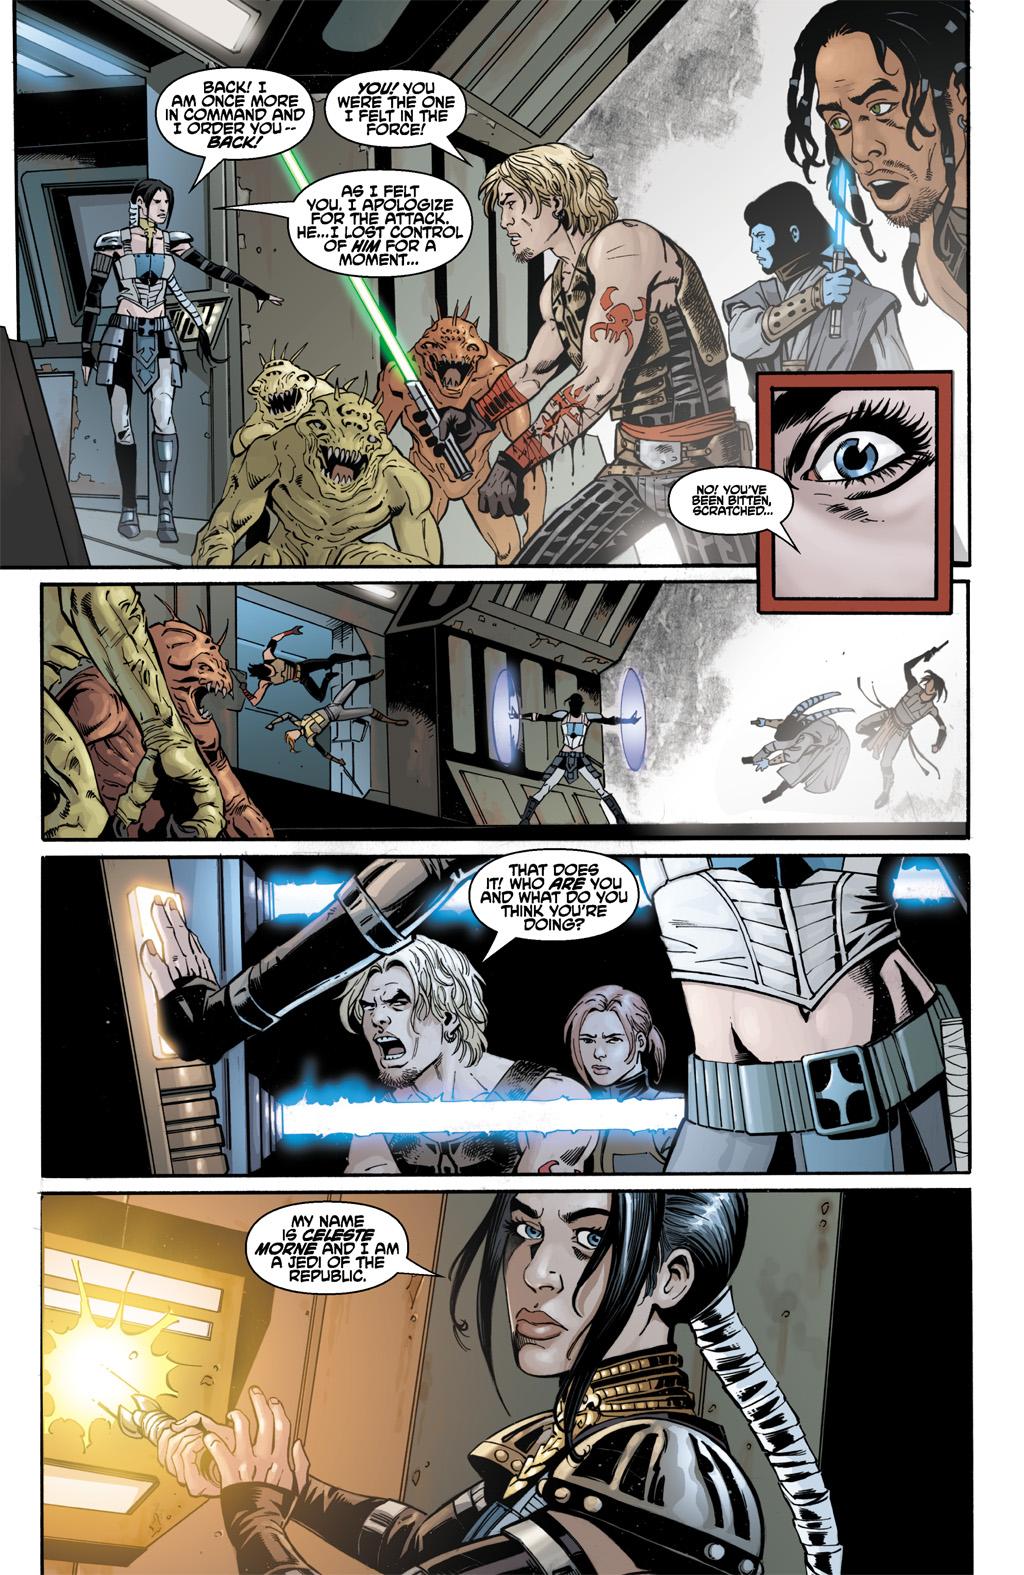 Darth Vader vs A'Sharad Hett - Page 3 V5P6h20Wk9Dom7OTj_C0tCTdlzpm7ELsdlM5gUVomI2gsDsRG-Kf9_N4IqBZJFFs-e44CtyEC-nsp_PV_lk_rD4V0yKn6Lf_rfRV6wd6PpHtZXOdqmUPcUVNvEgPL948aR1Tjiwt